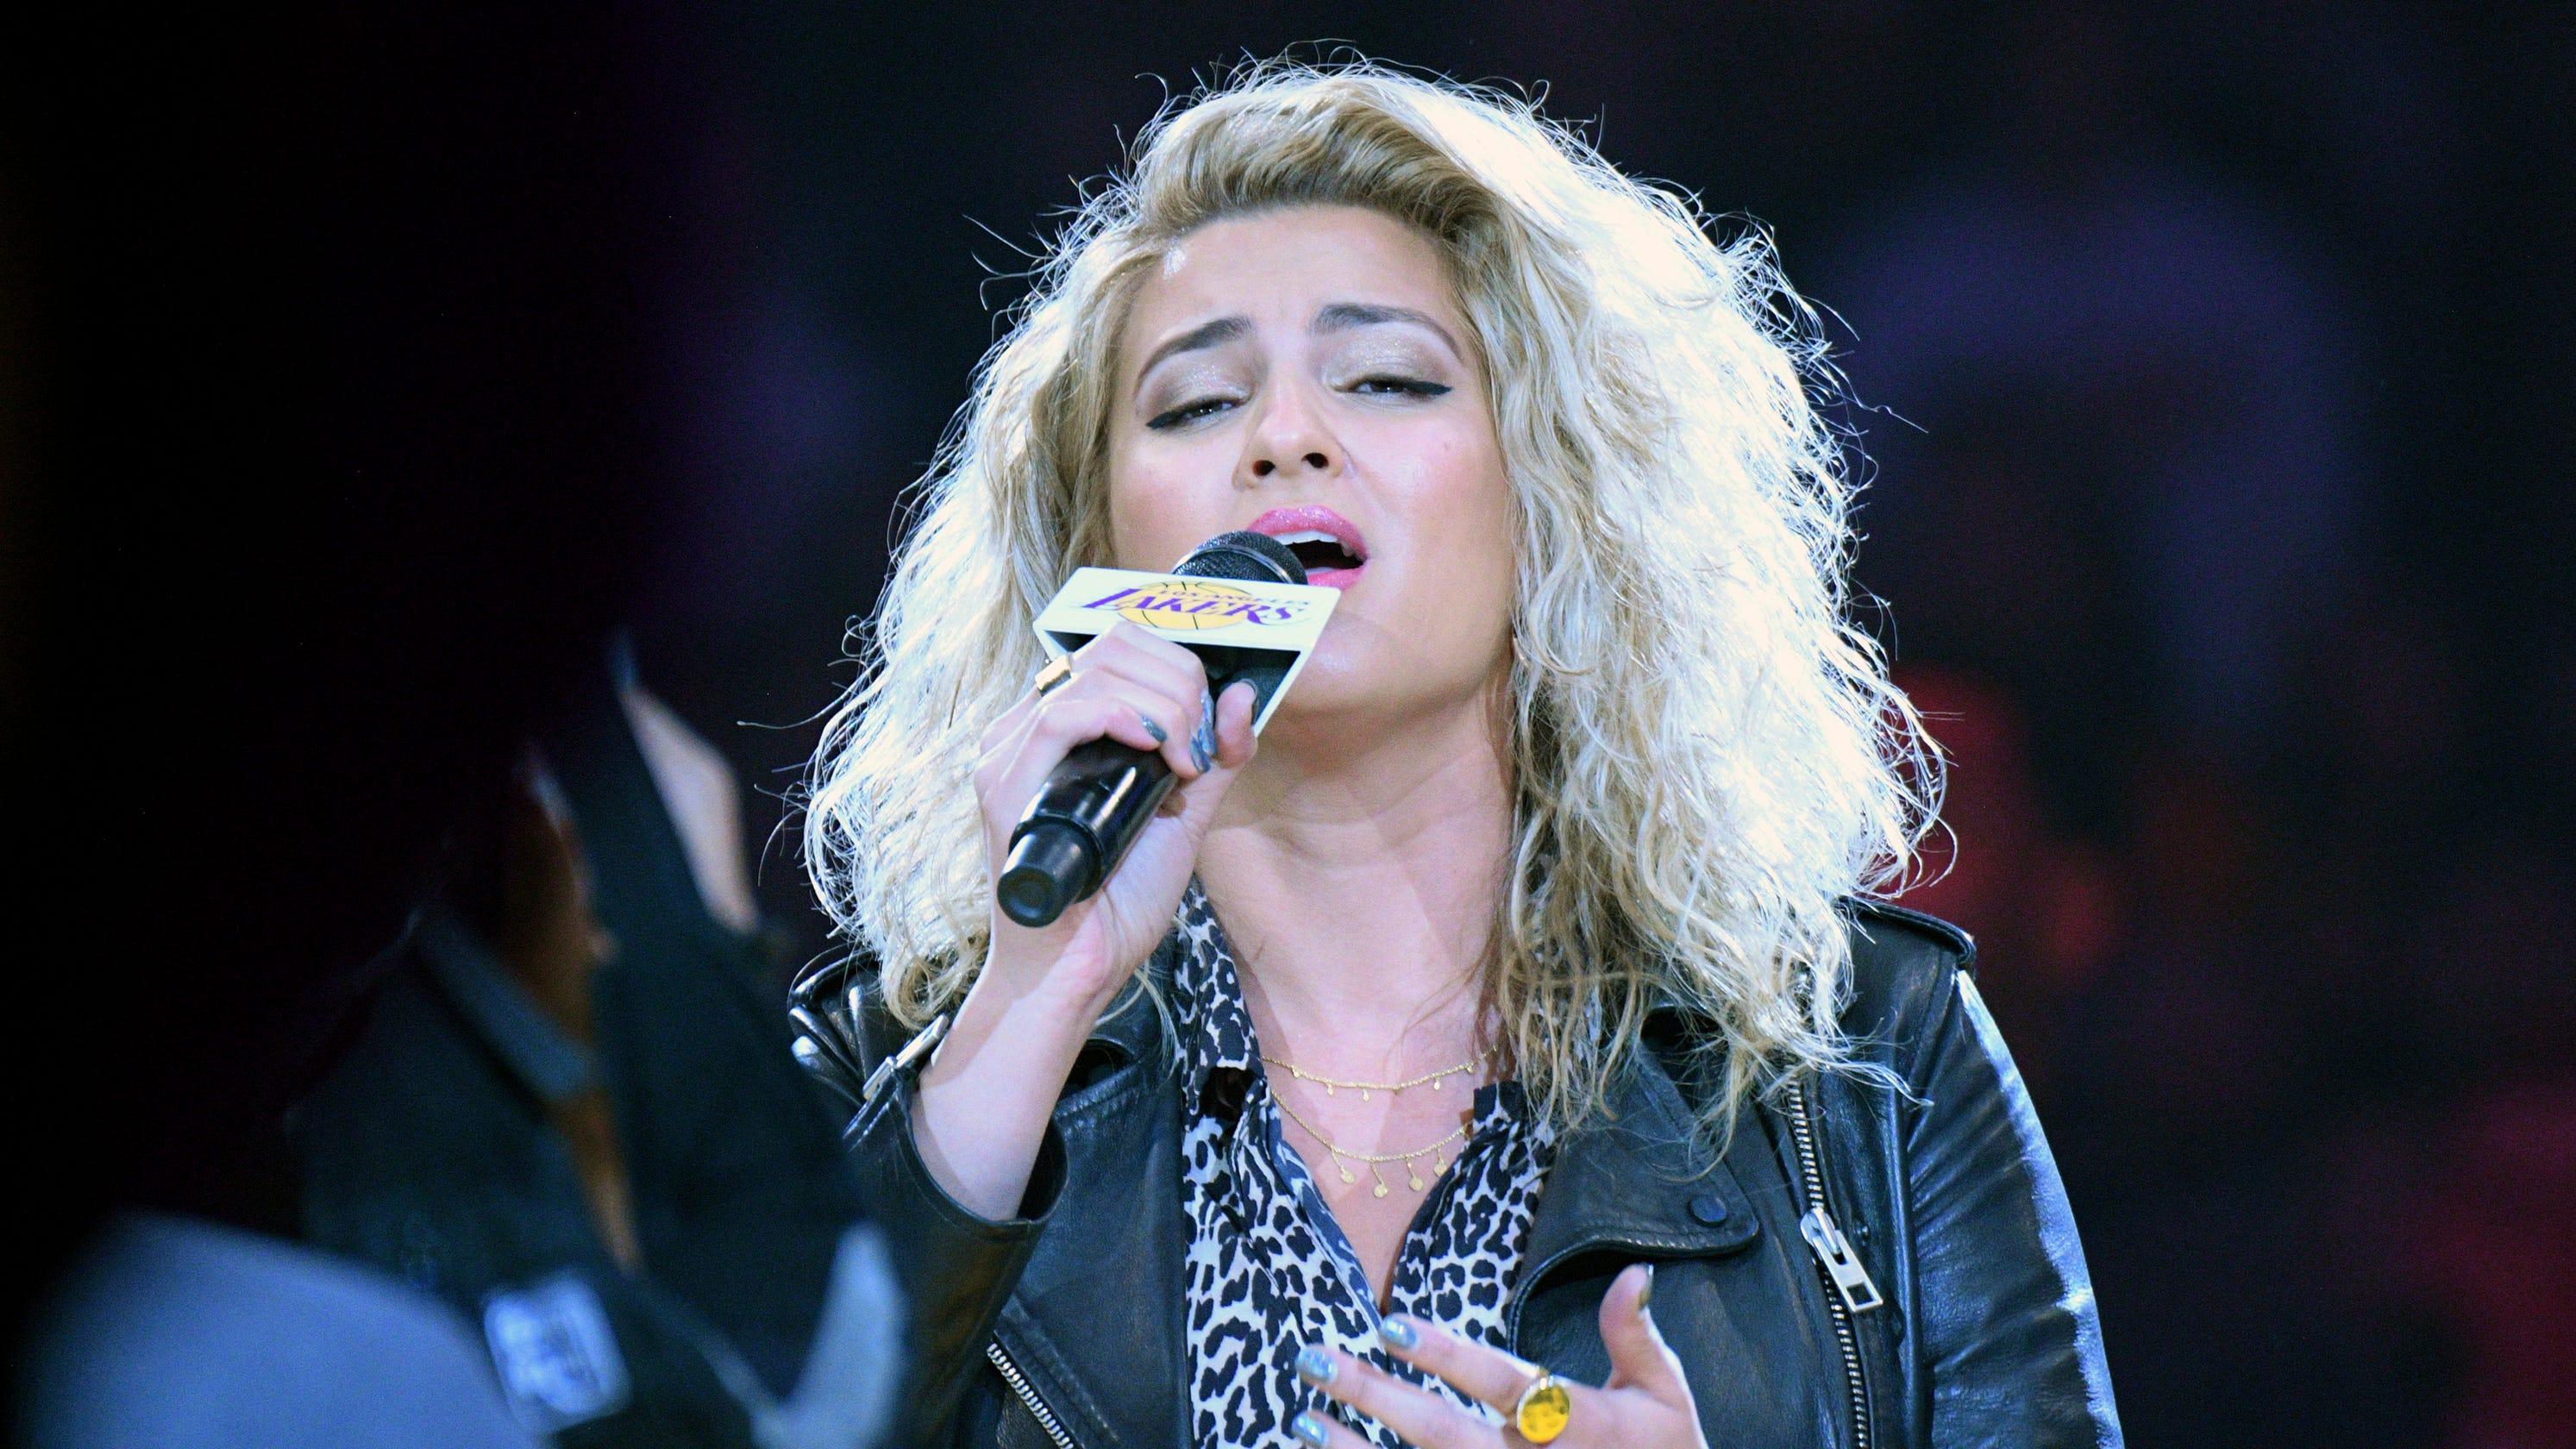 Grammy Winner Tori Kelly to Perform National Anthem